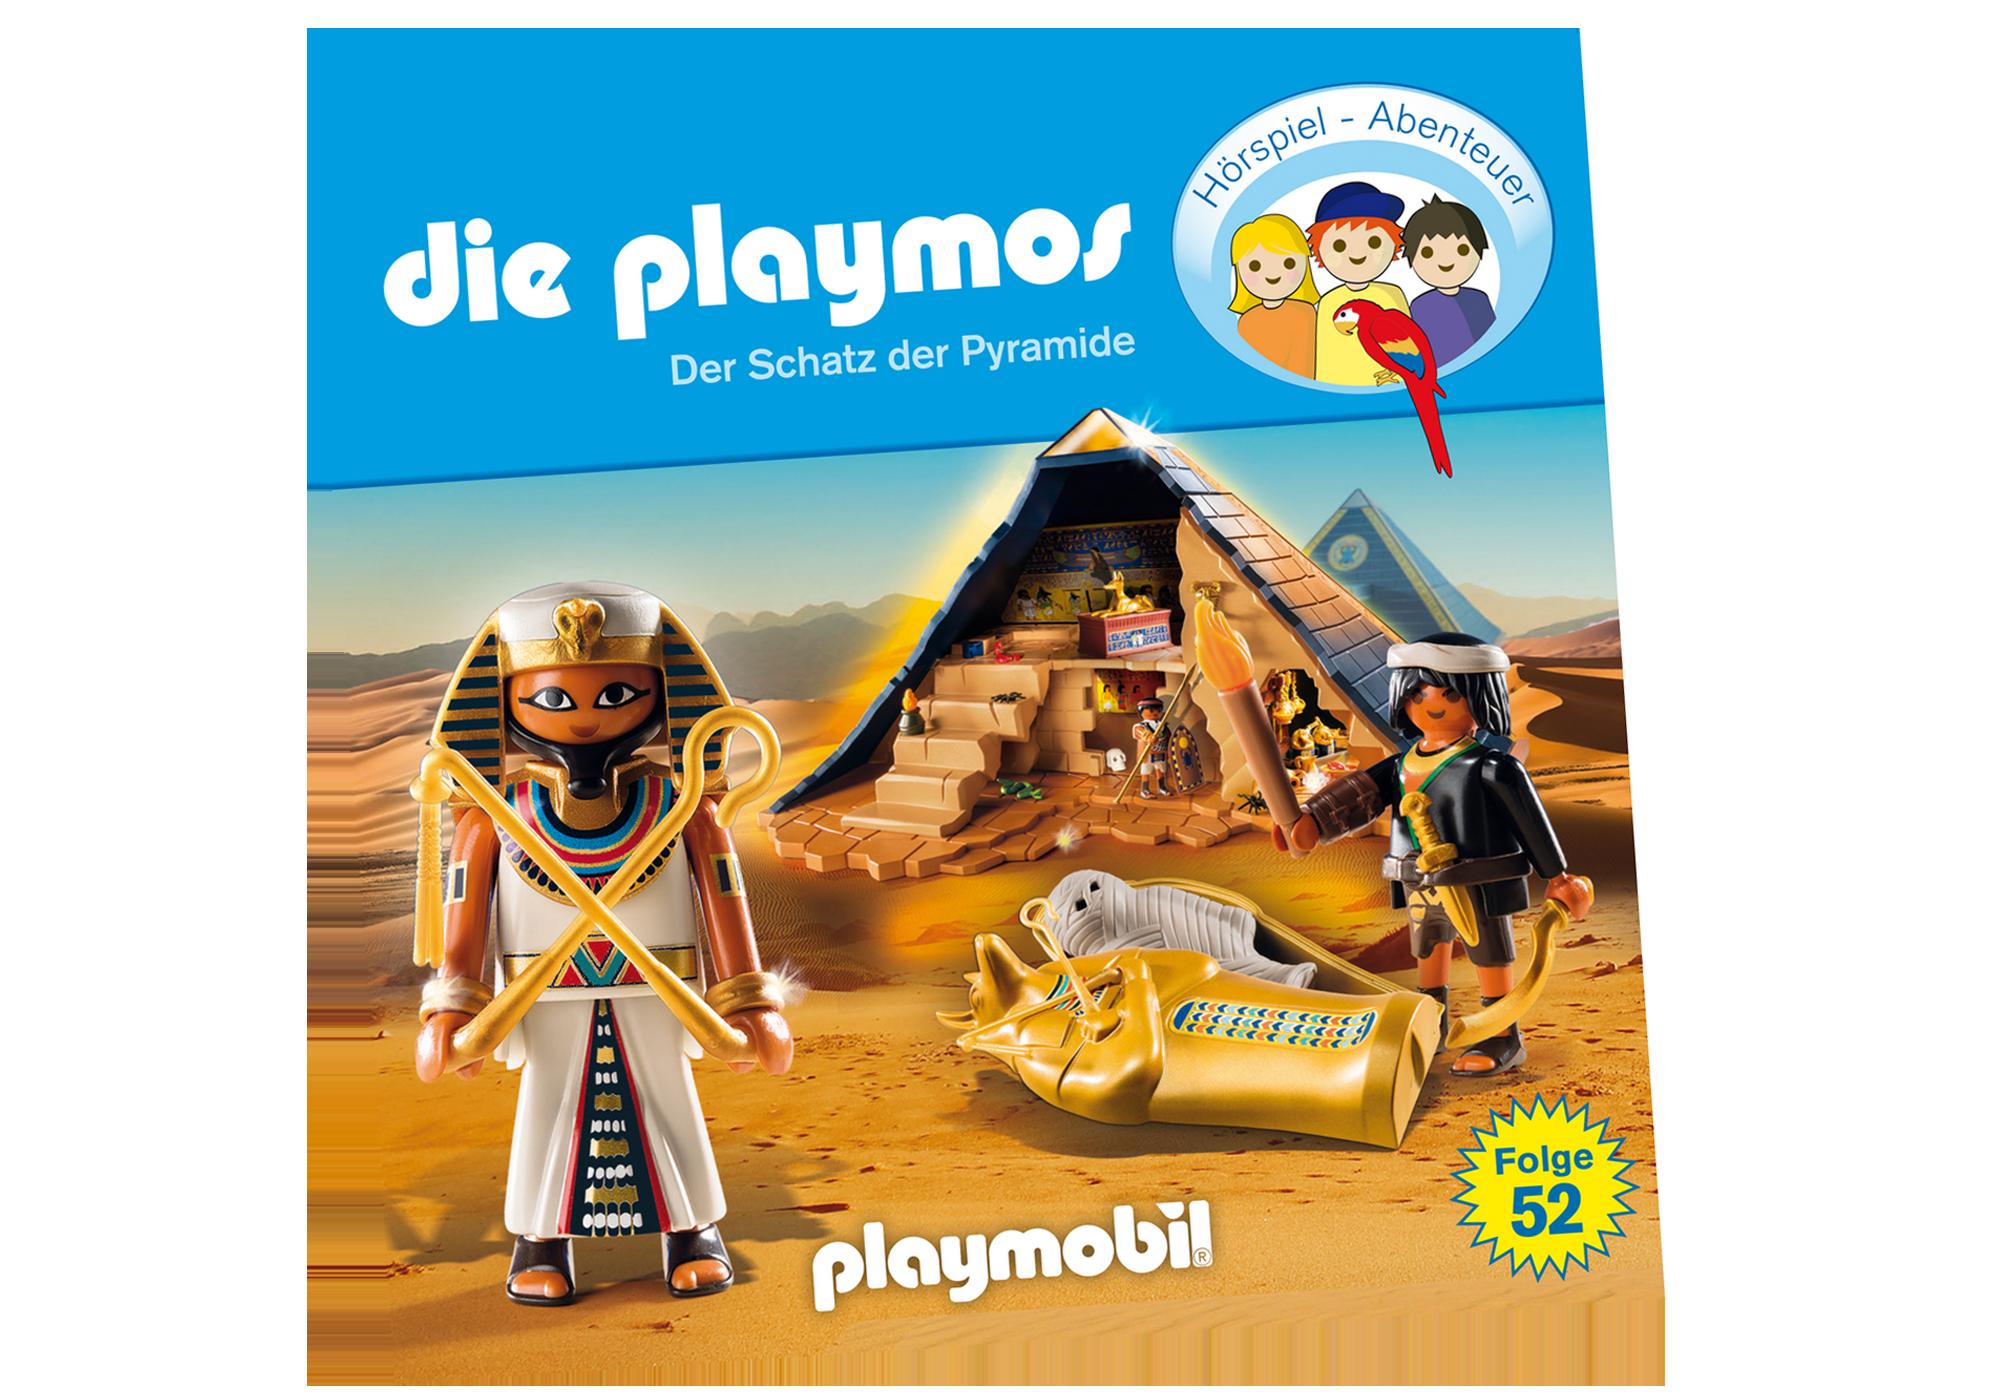 http://media.playmobil.com/i/playmobil/80259_product_detail